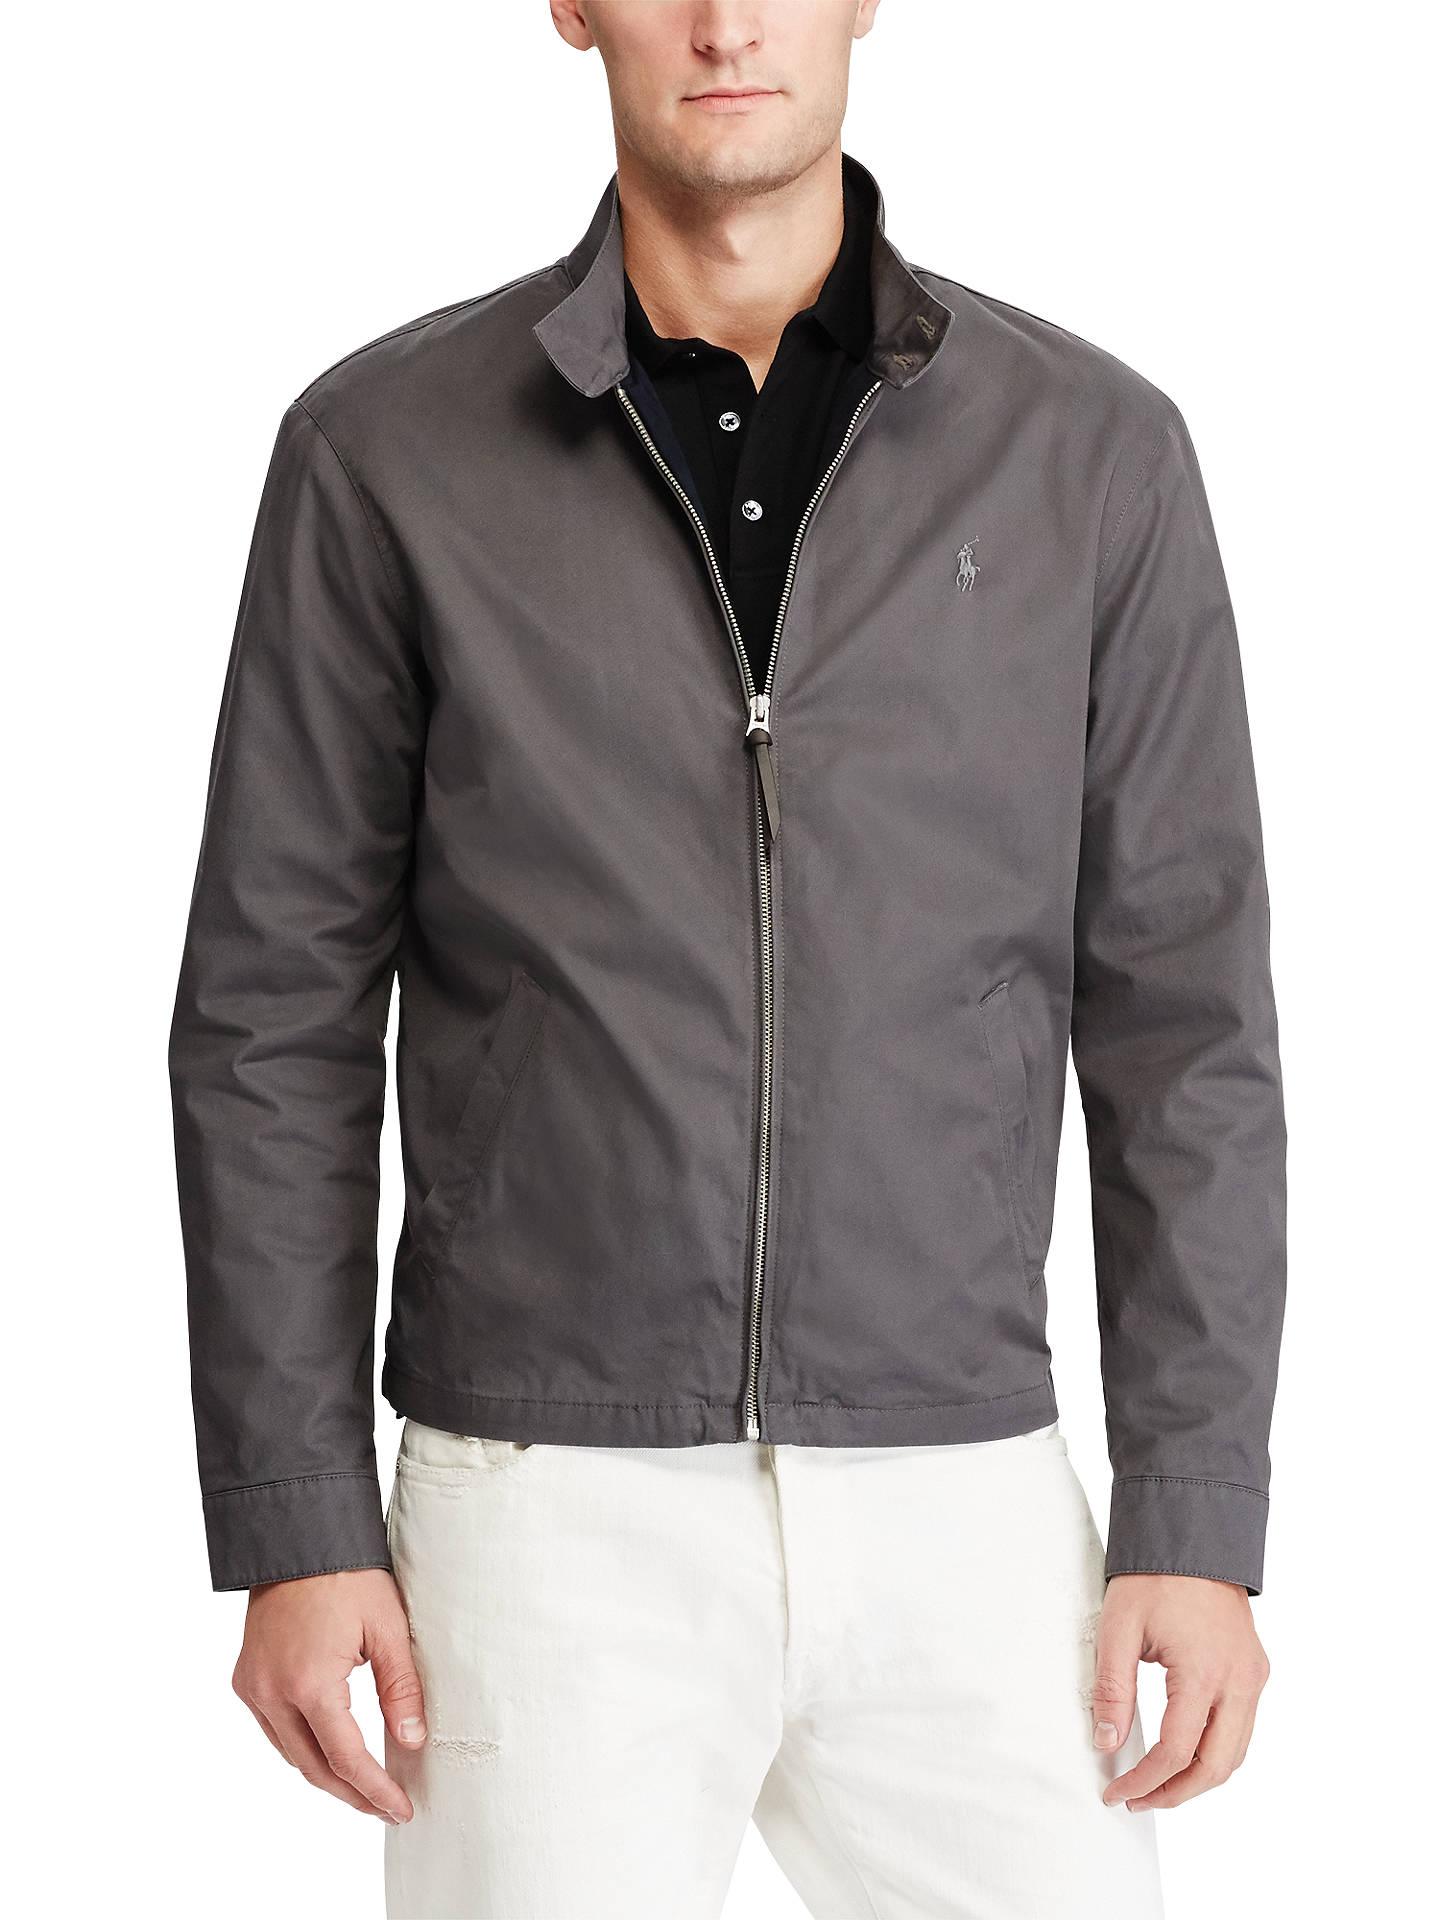 cde6c348b Buy Polo Ralph Lauren Barracuda Cotton Twill Jacket